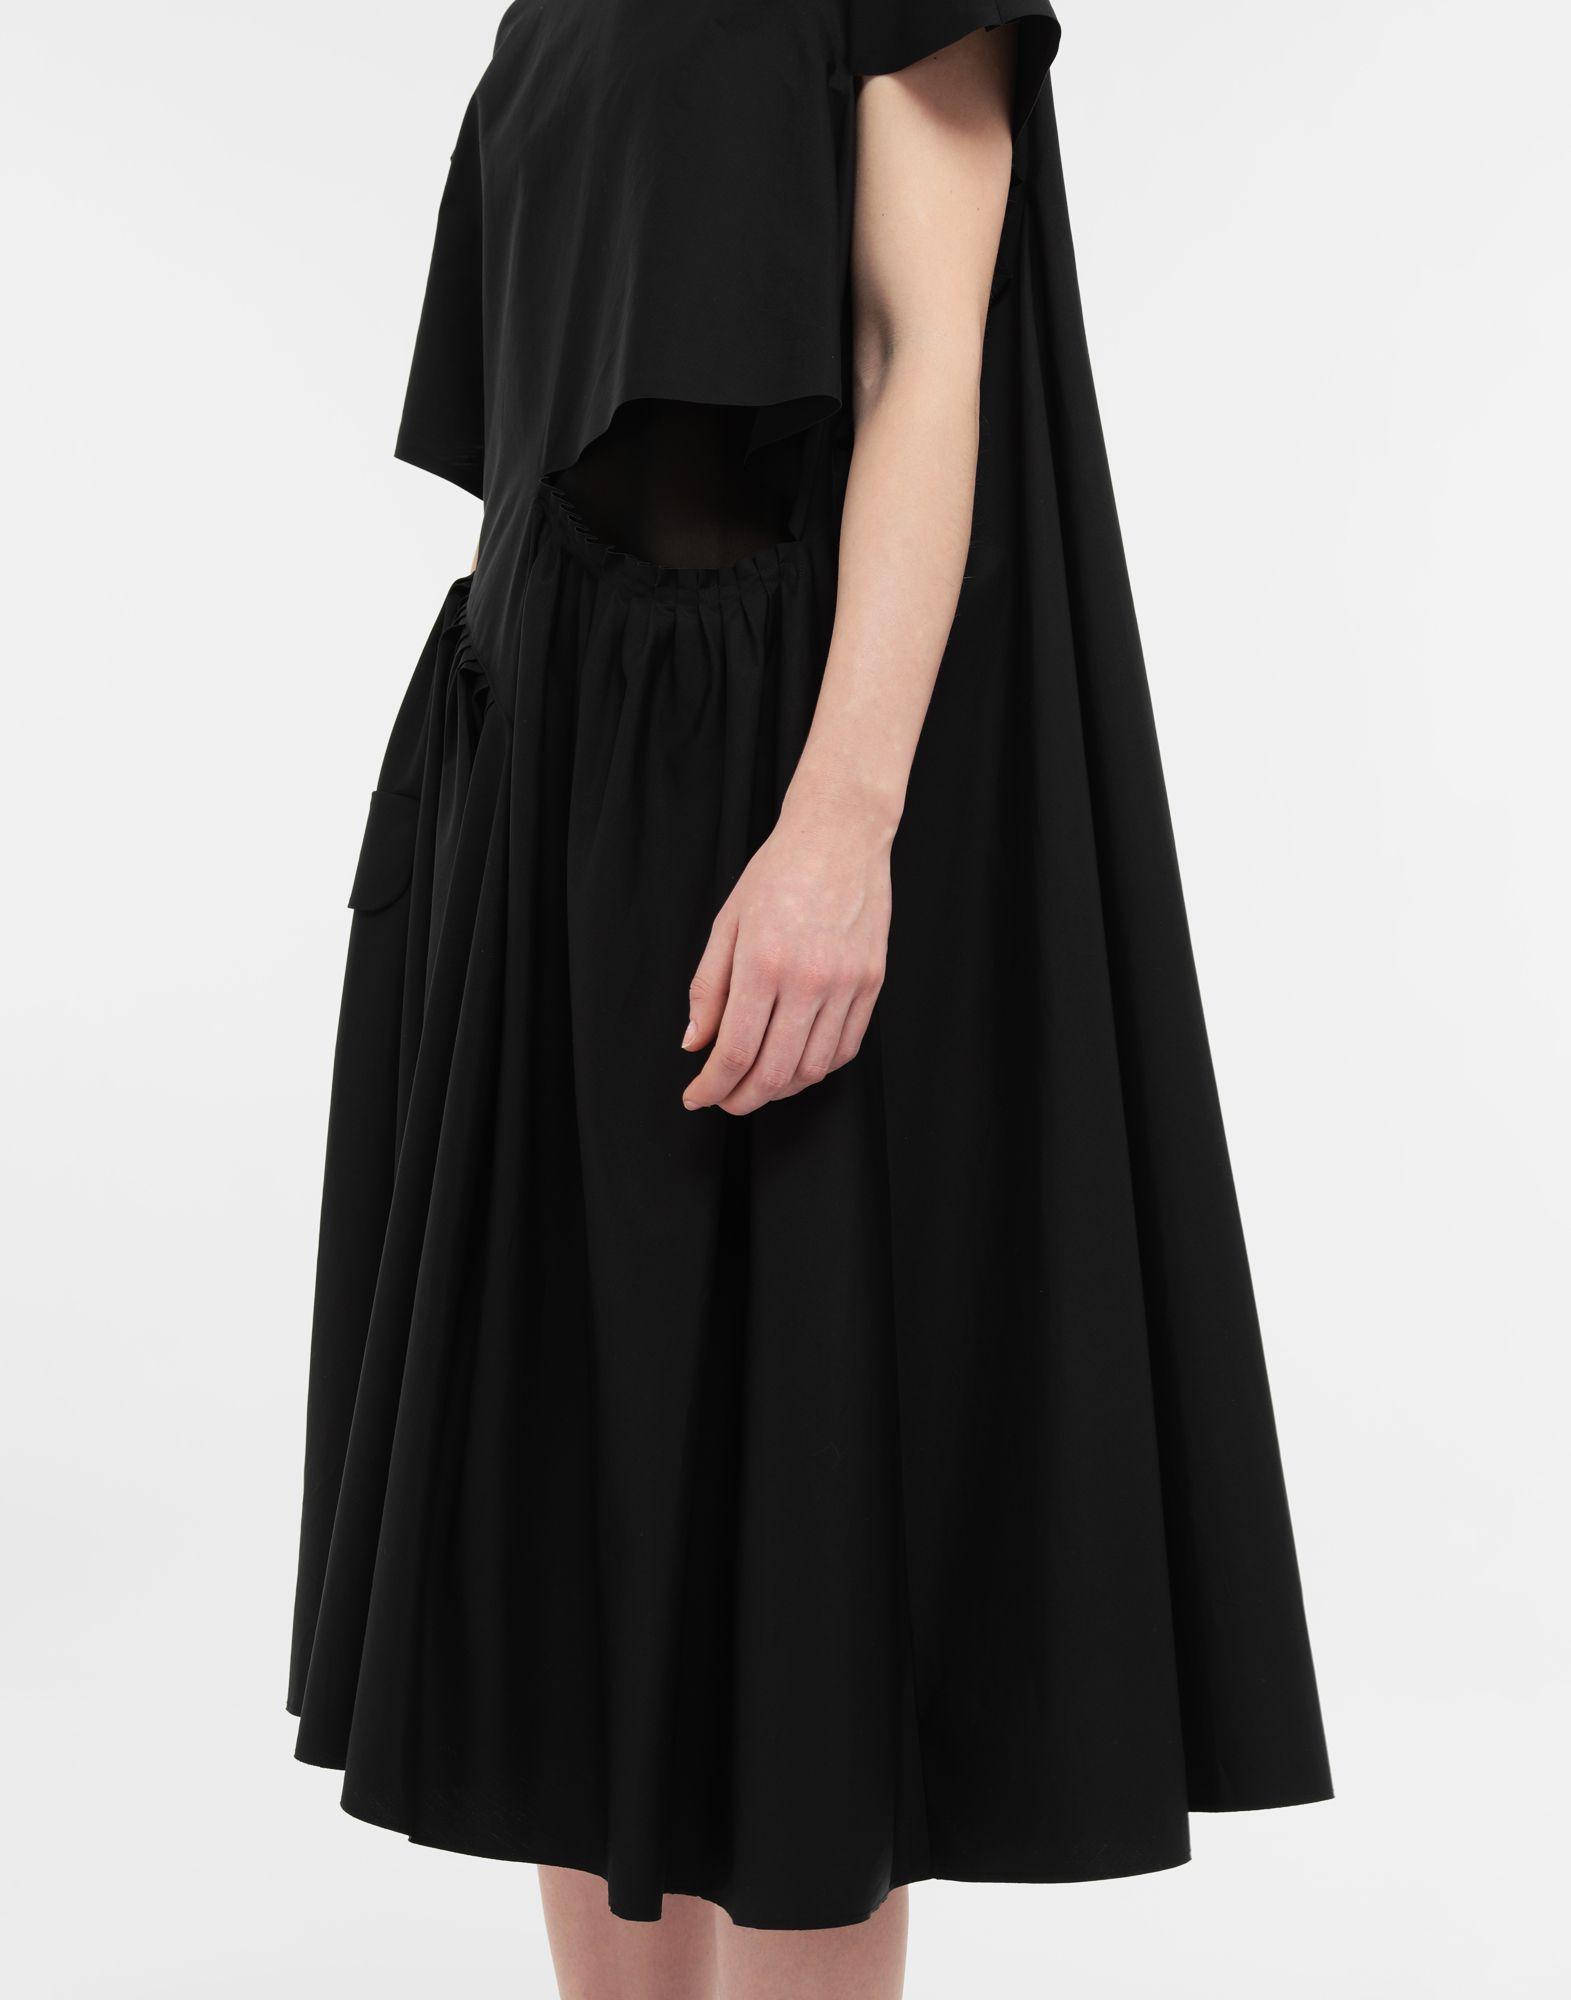 MAISON MARGIELA Décortiqué gathered midi dress 3/4 length dress Woman a